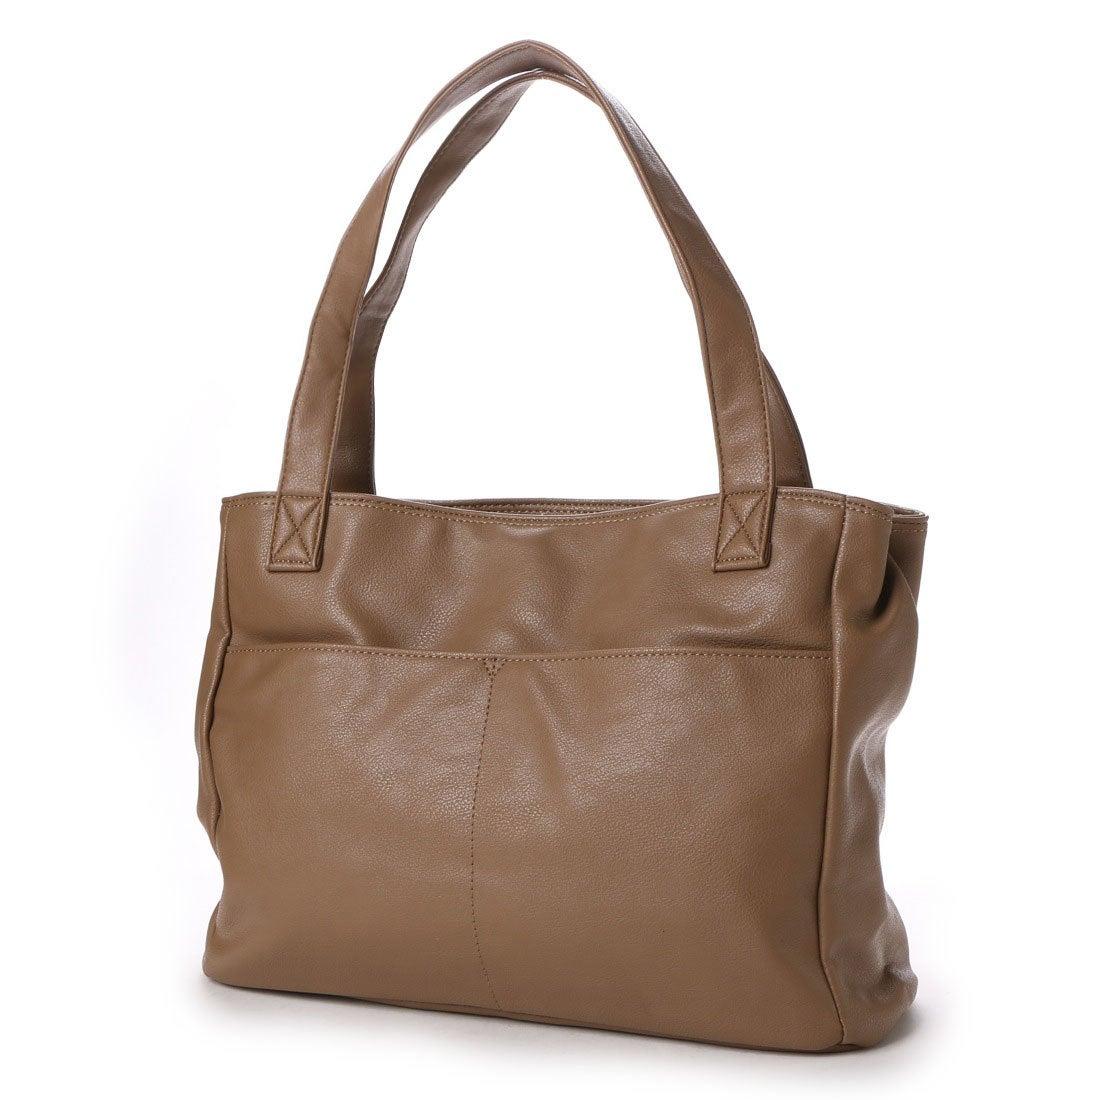 【SALE 8%OFF】ラナサックス Rana Sacs Rana Sacs A4対応2層式合皮トートバッグ (チャ) レディース